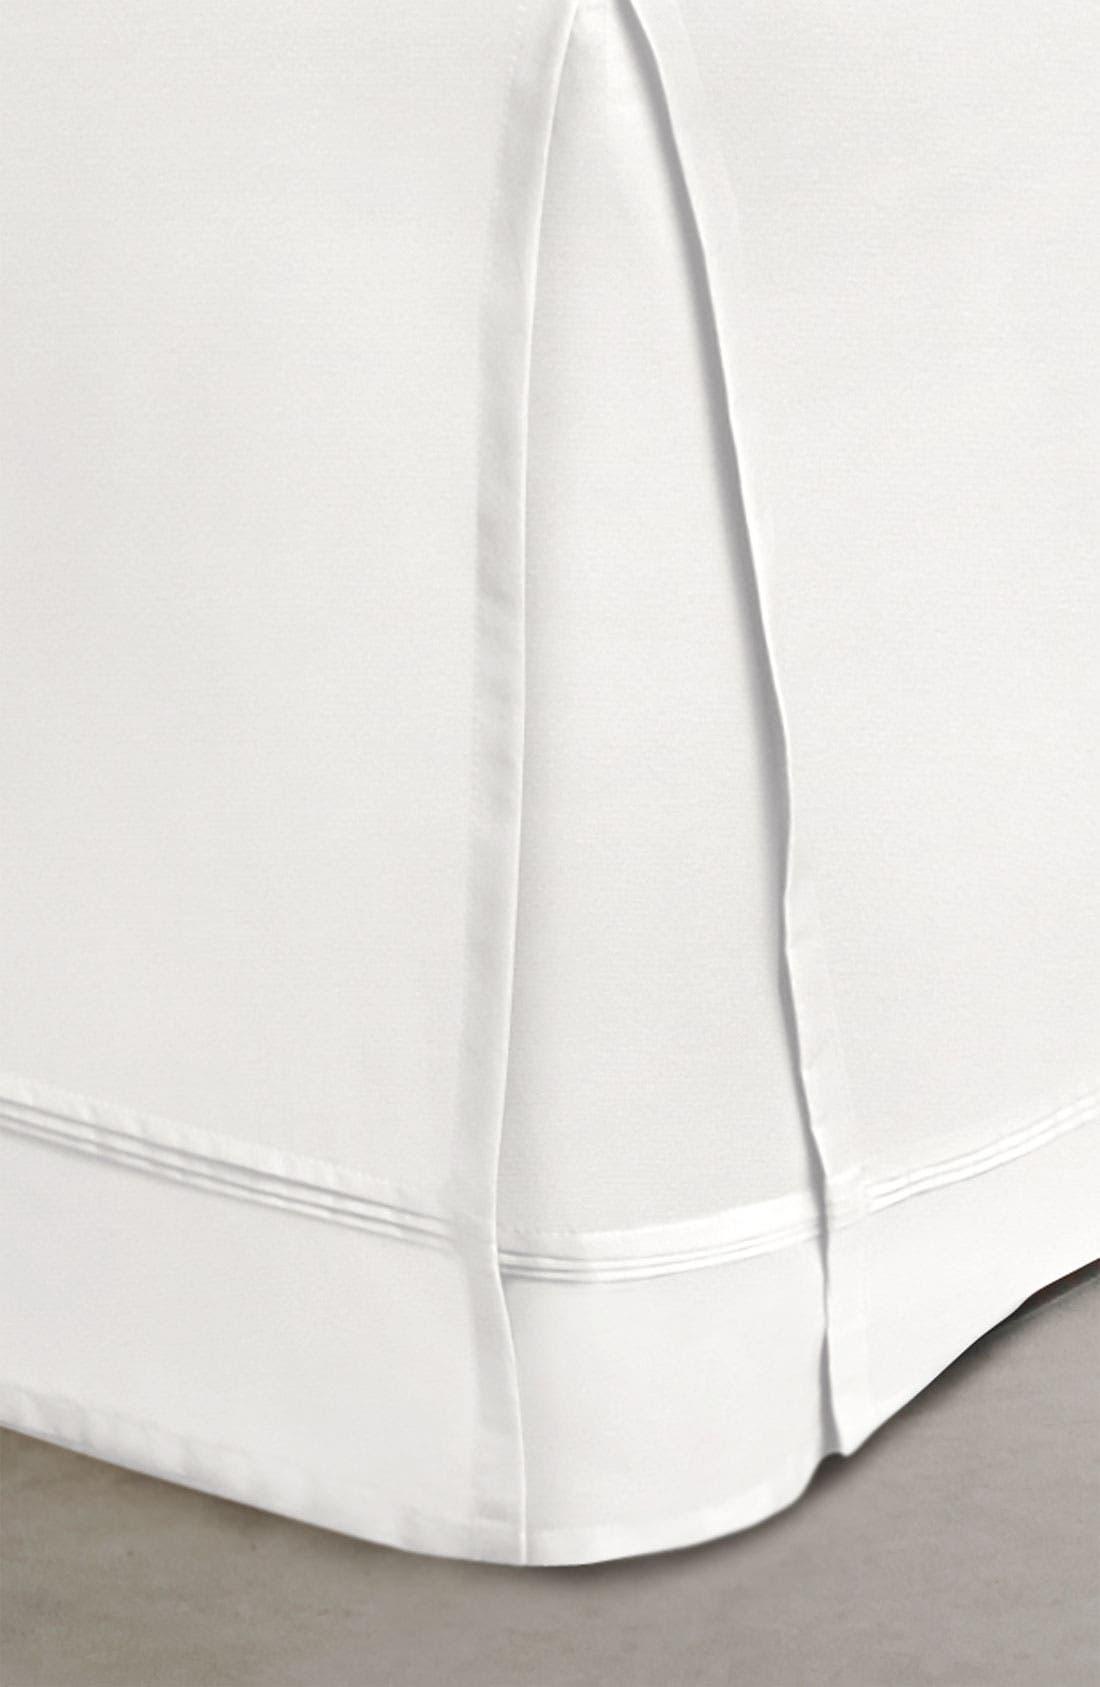 Alternate Image 1 Selected - Donna Karan 'Lustre Seam' Bed Skirt